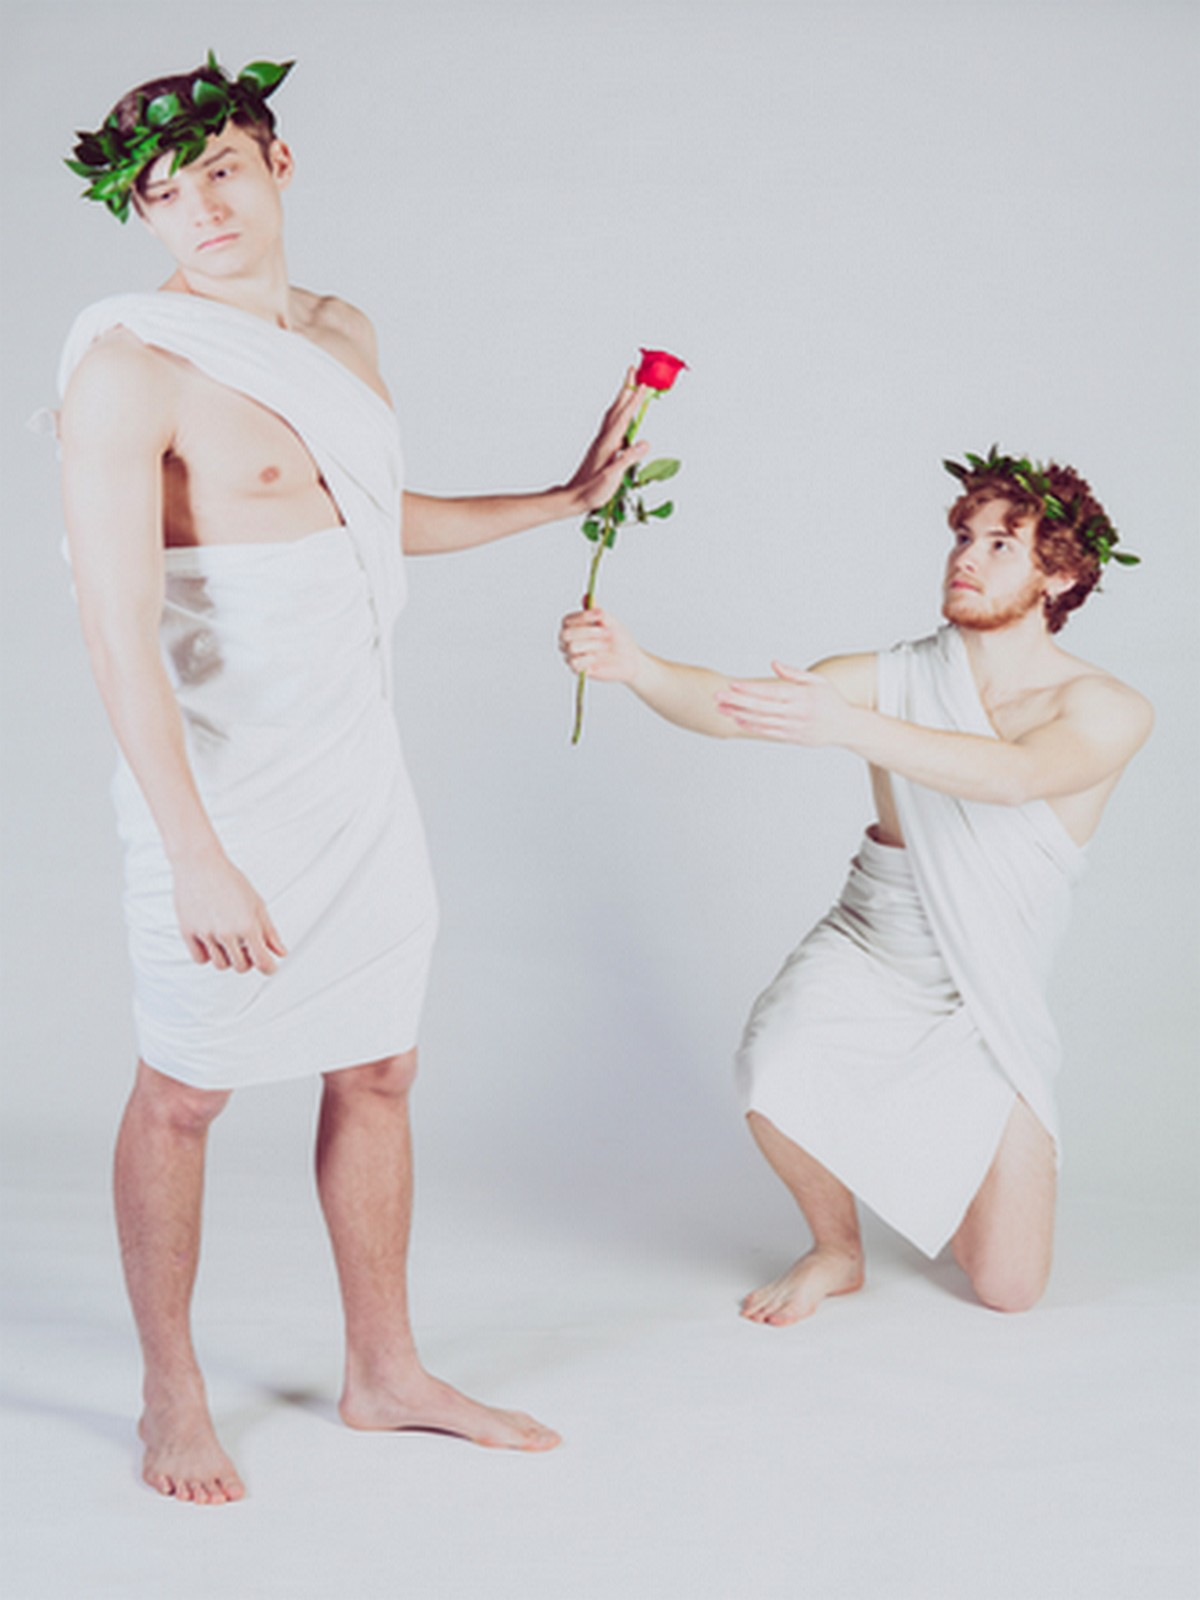 alessandro de bellis QxX0jg9v8hI unsplash - Lagi gay Melayu kahwin, kali ini di Greece